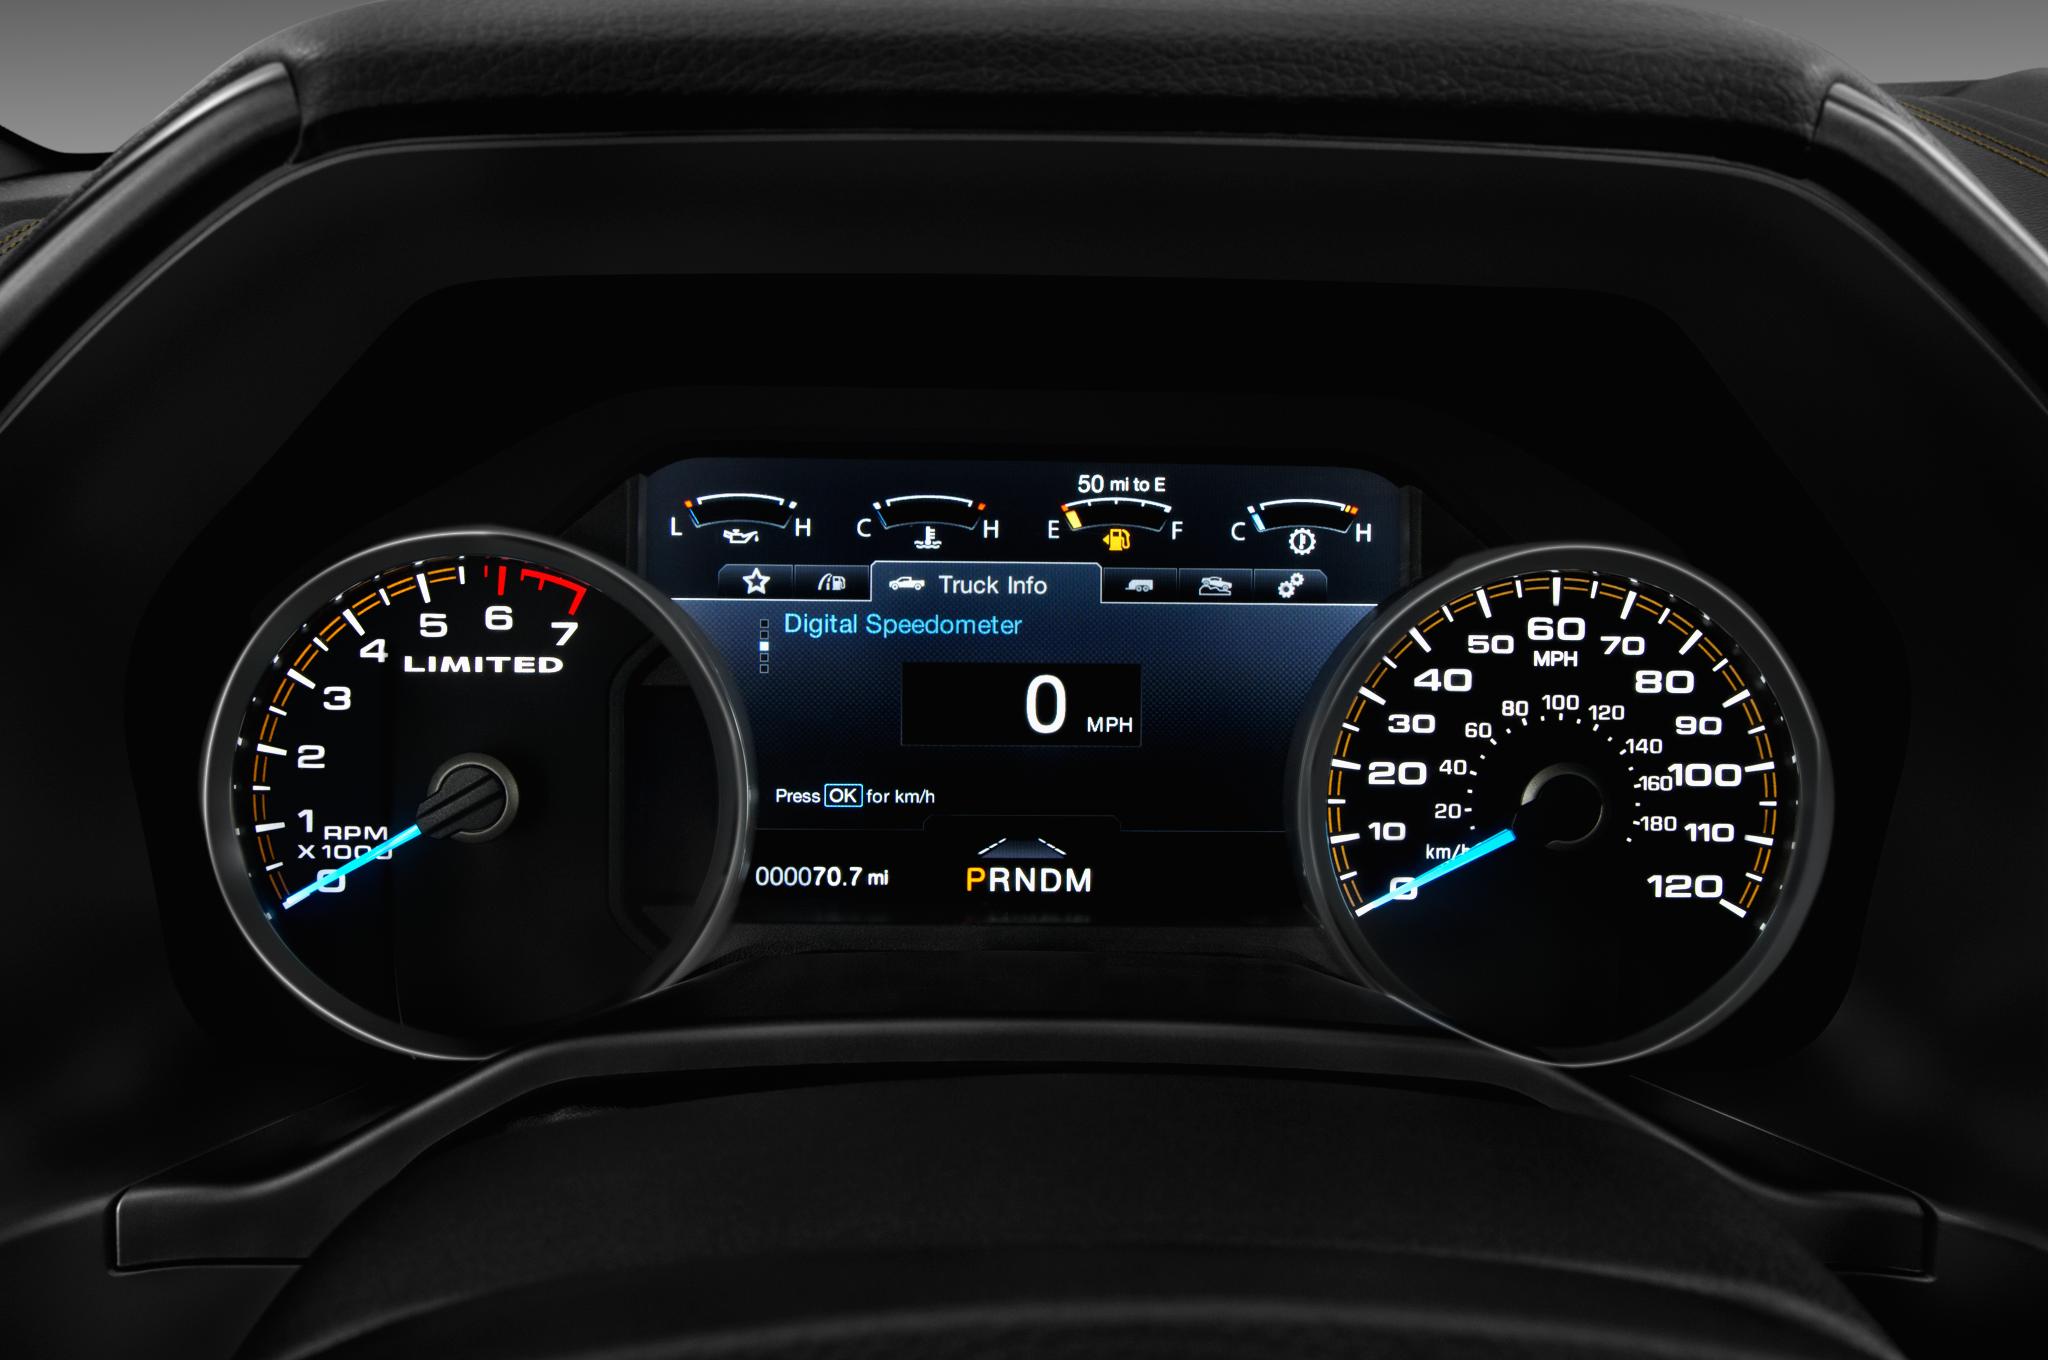 Plug-in Hybrid Ford F-150 Spied Testing? | Automobile Magazine